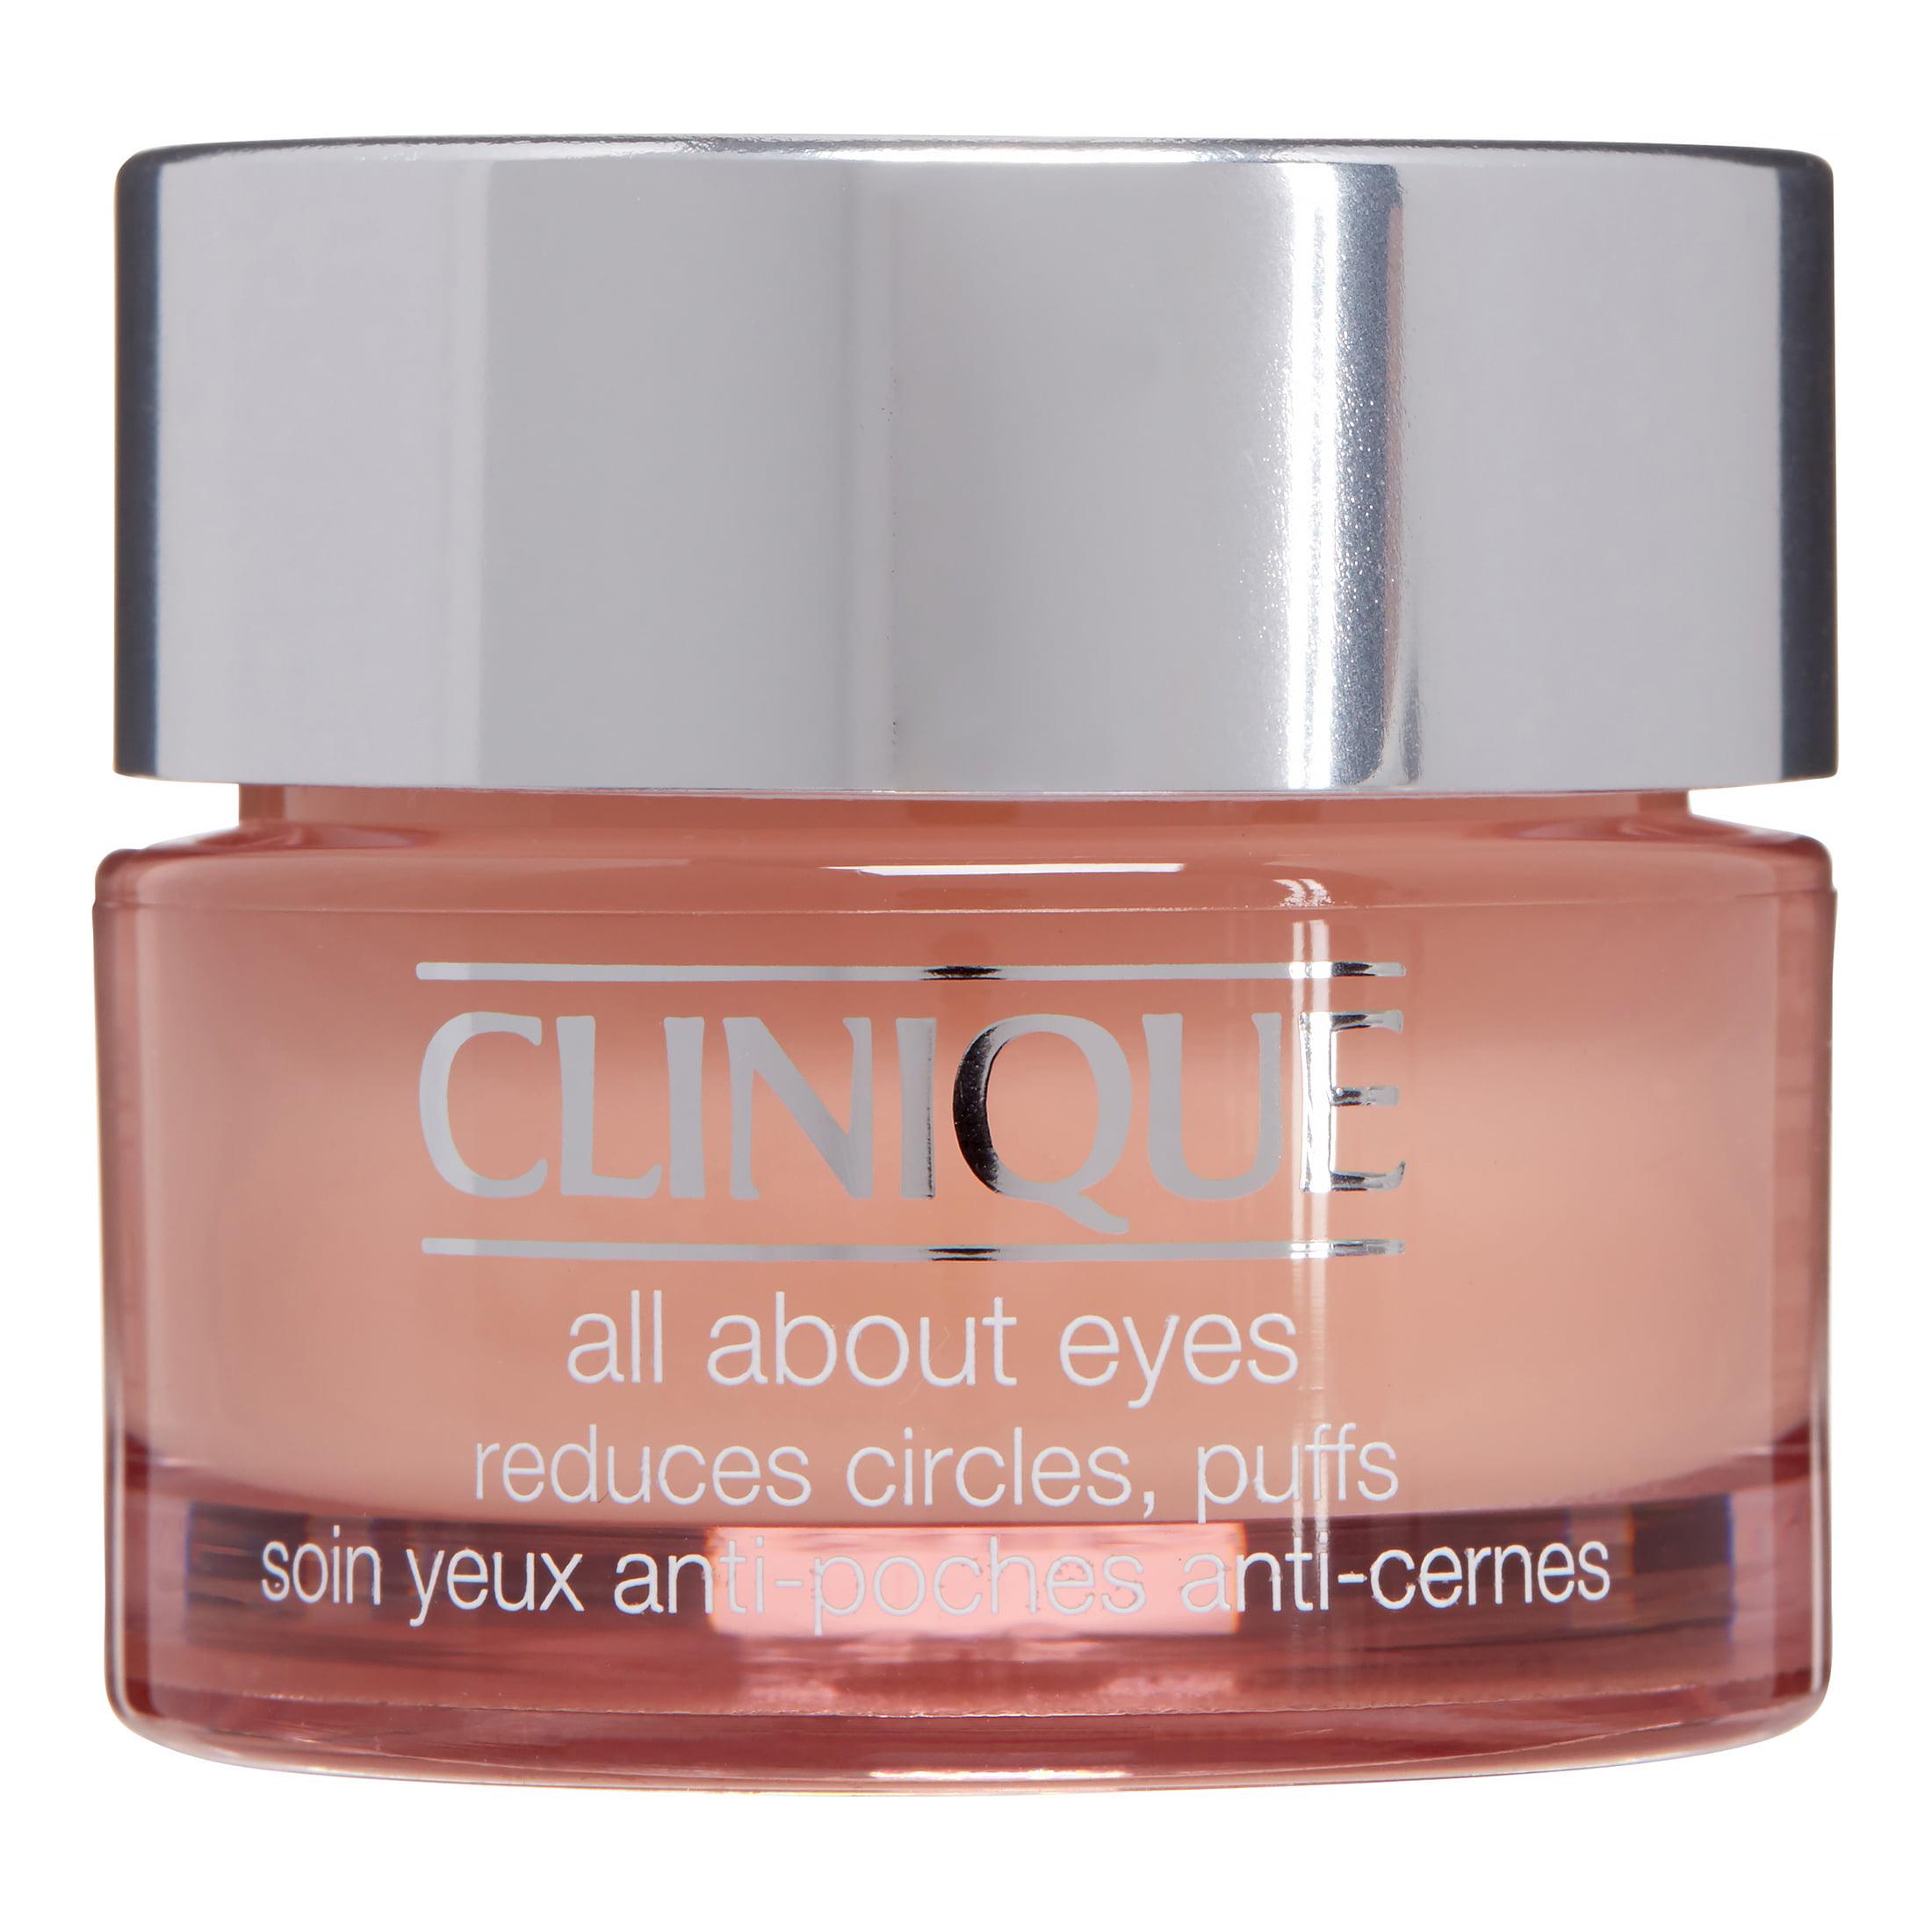 Clinique All About Eyes, Eye Cream, 0.5 Oz